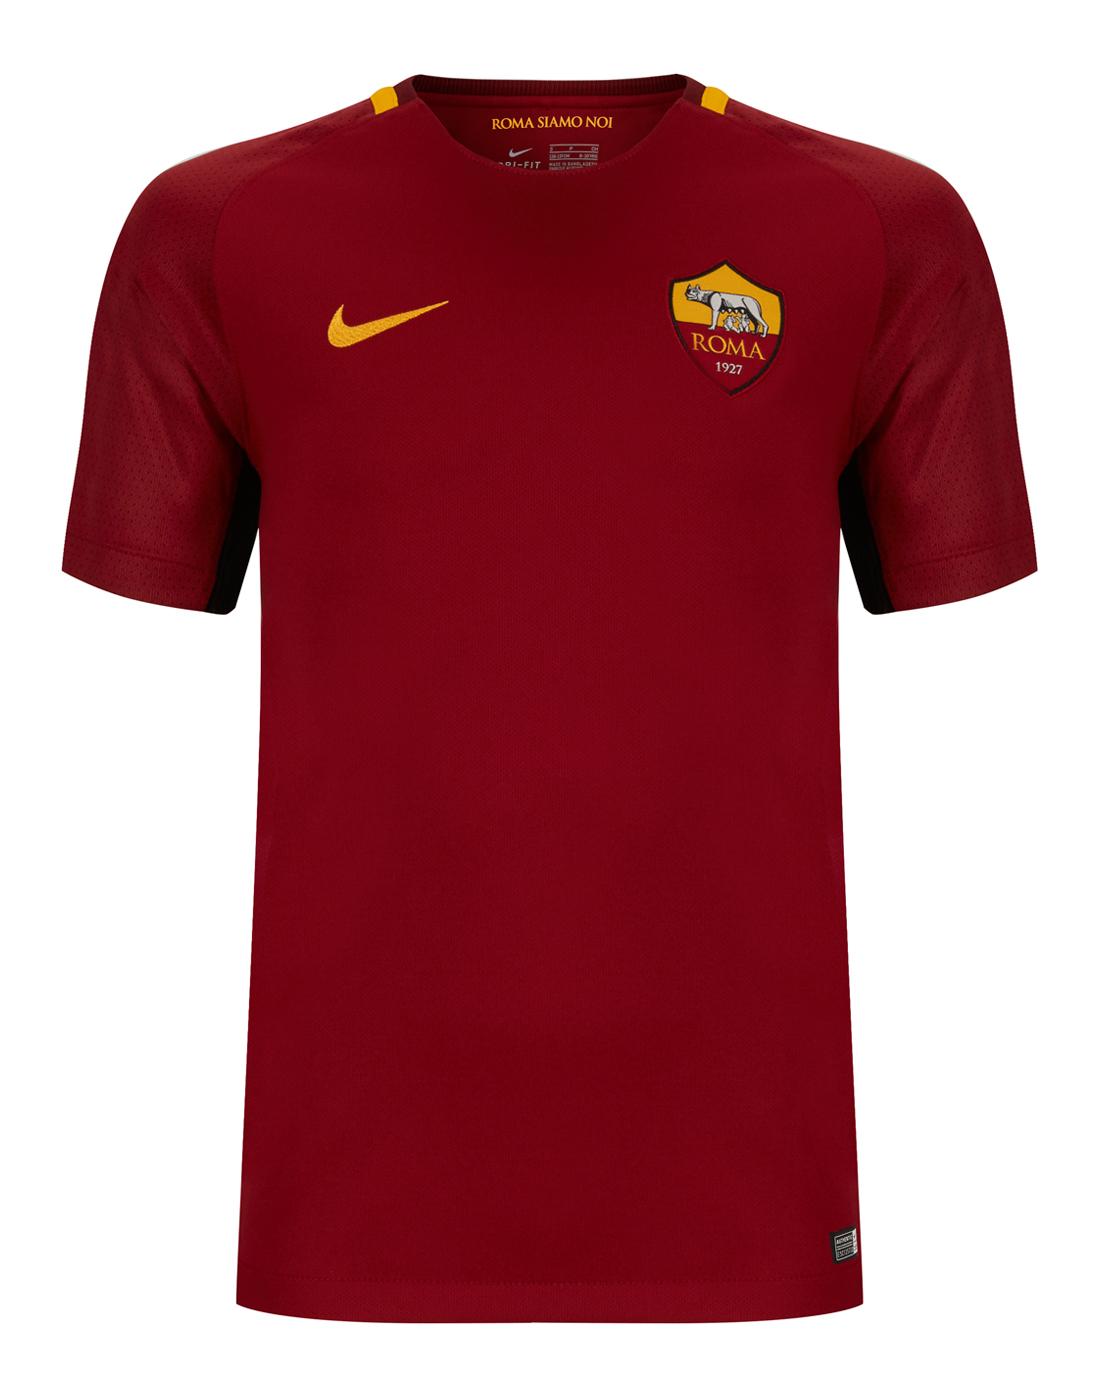 Nike Kids Roma 17 18 Home Jersey  94e9c9cc32